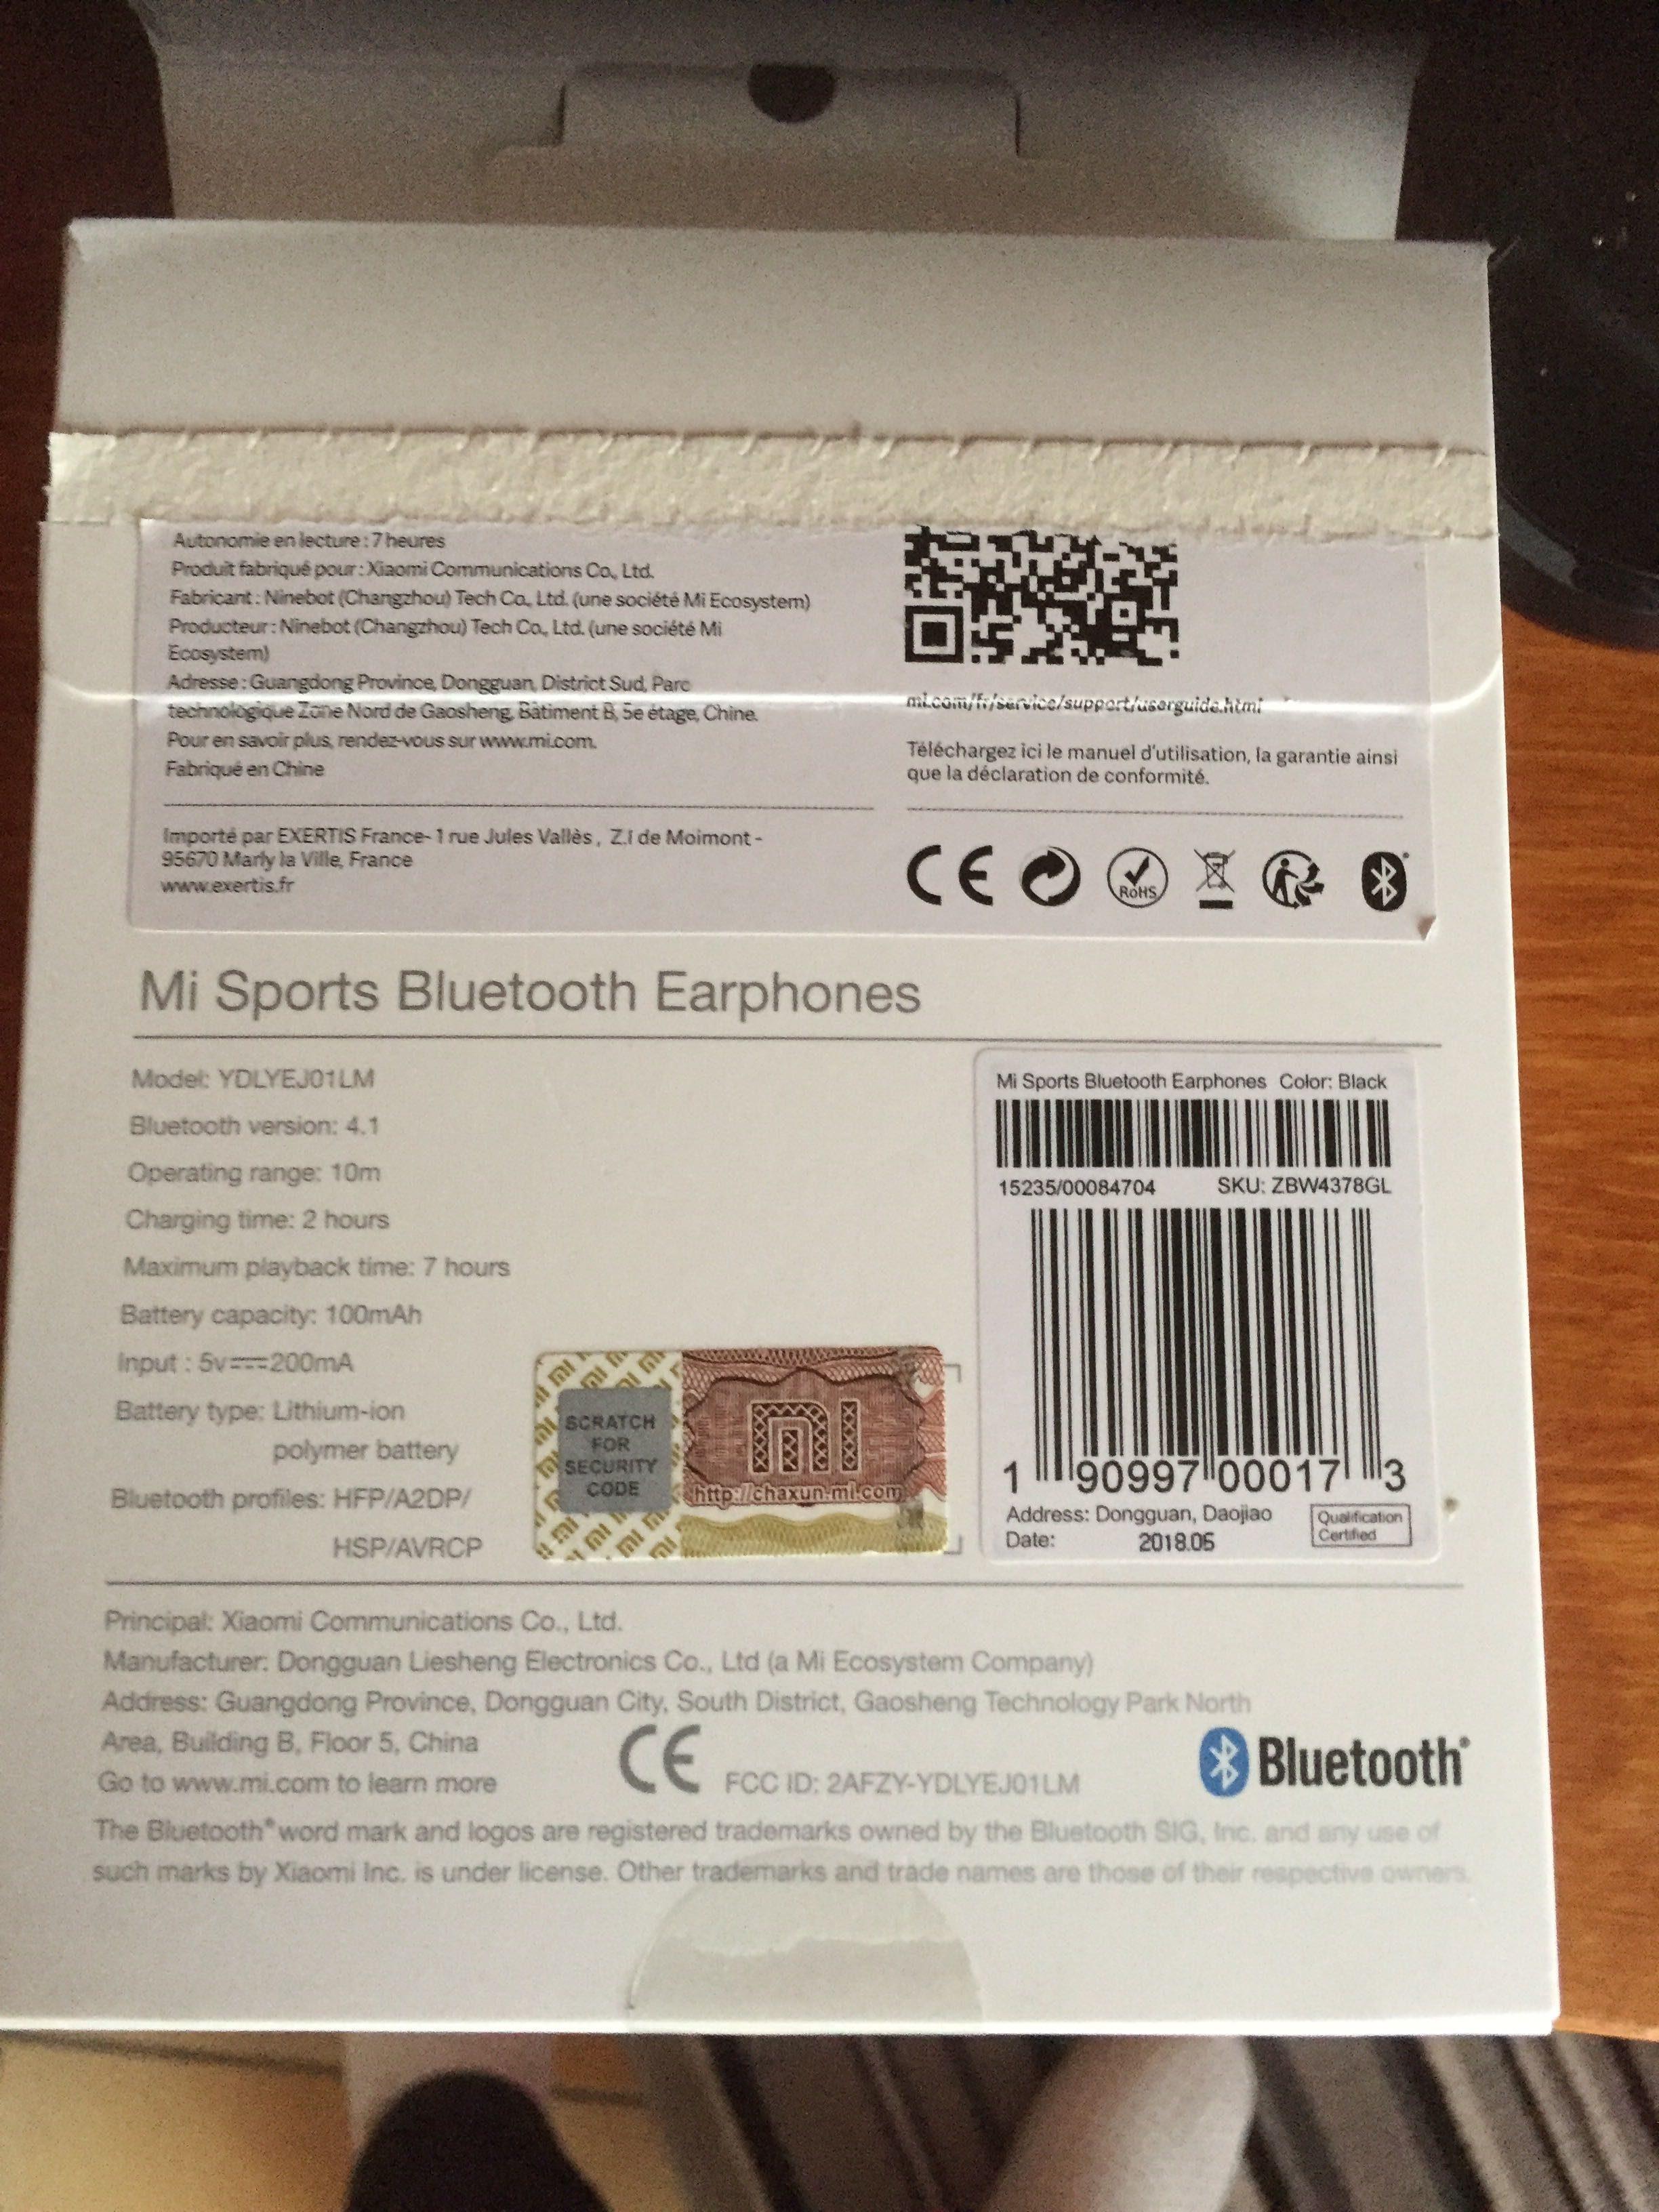 Mi sports Bluetooth earphones - Produit - fr